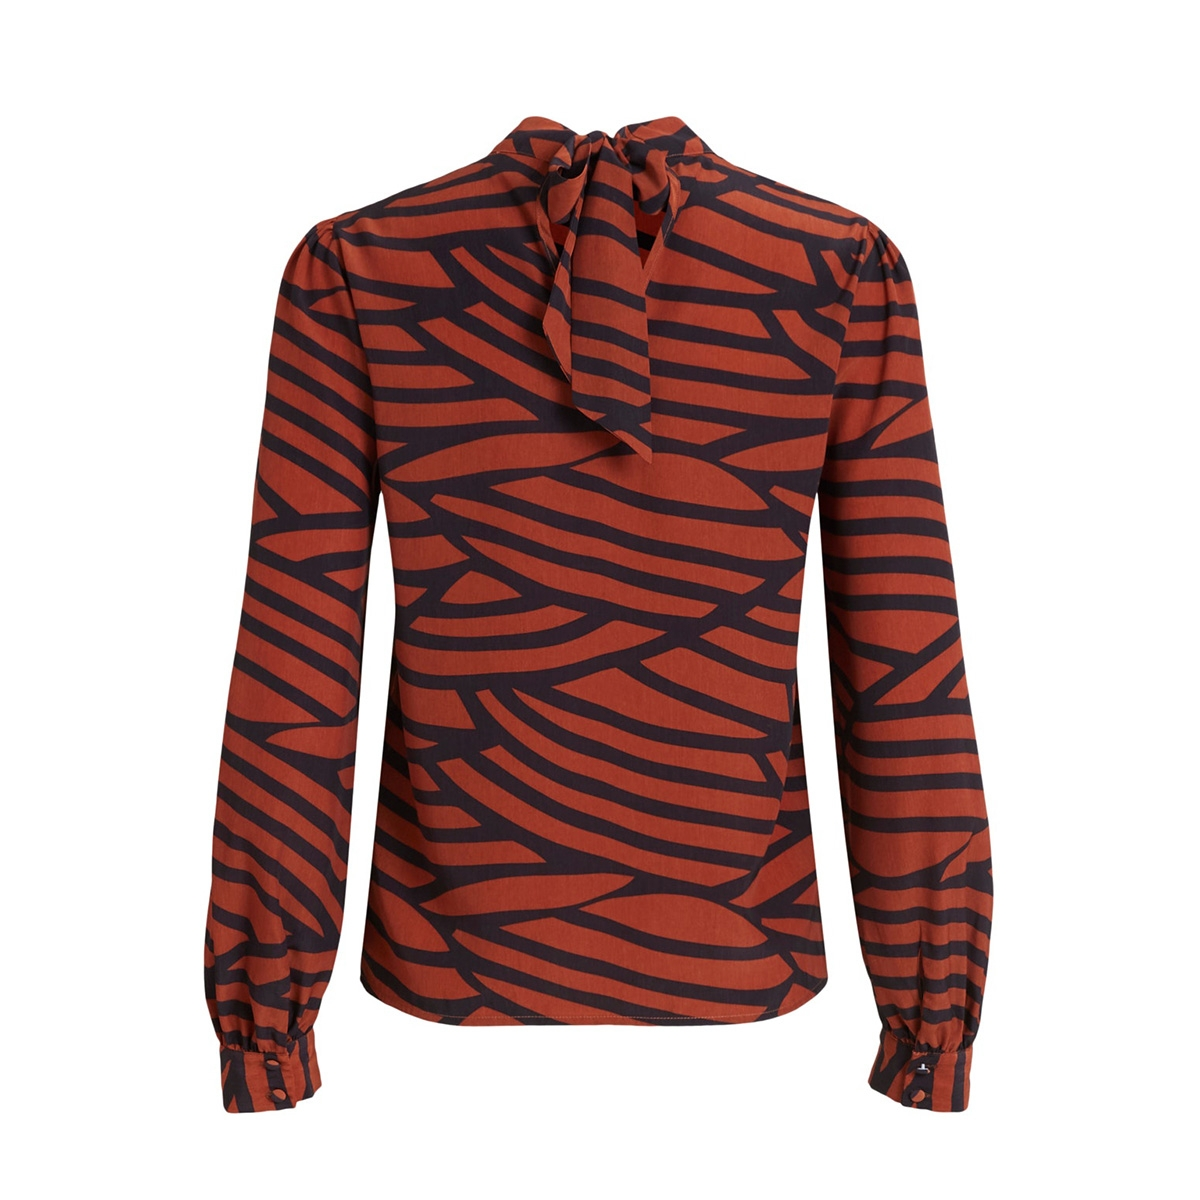 vimullan l/s top /rx 14059342 vila blouse black/stripes